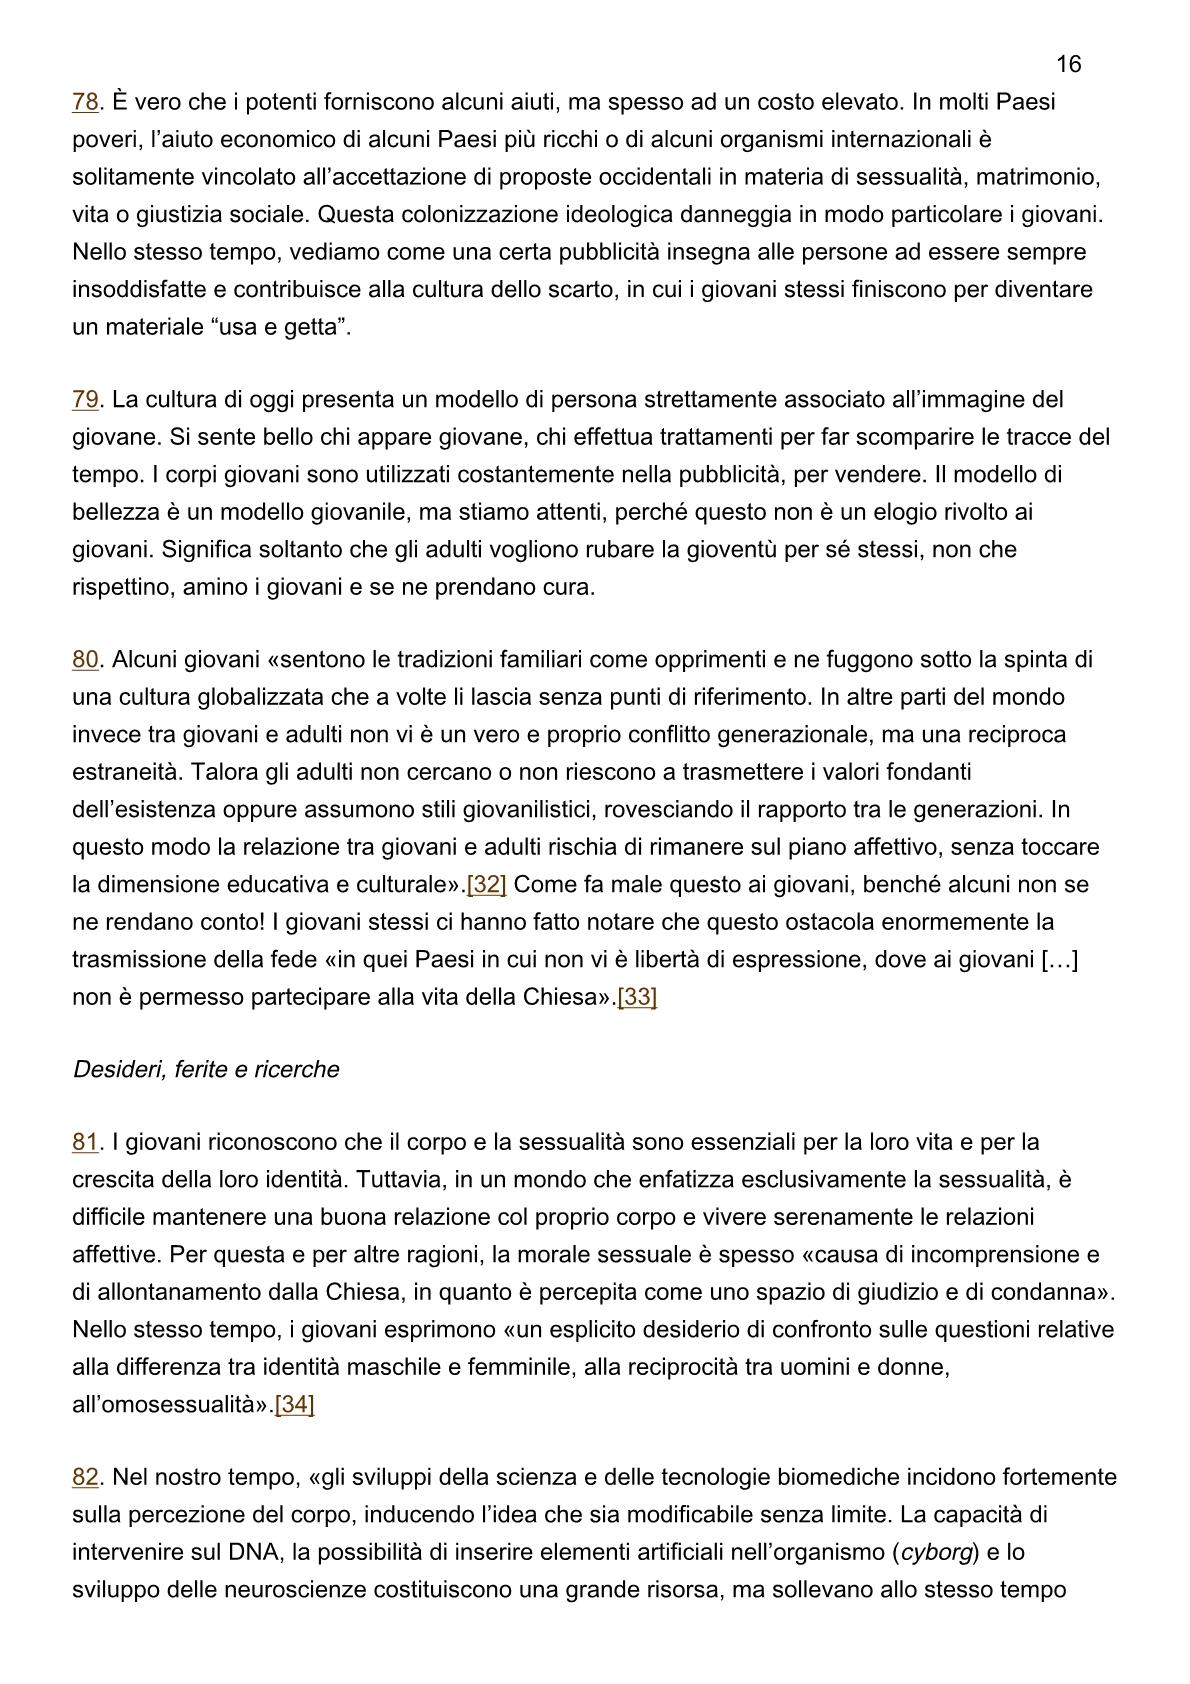 papa-francesco_esortazione-ap_20190325_christus-vivit16